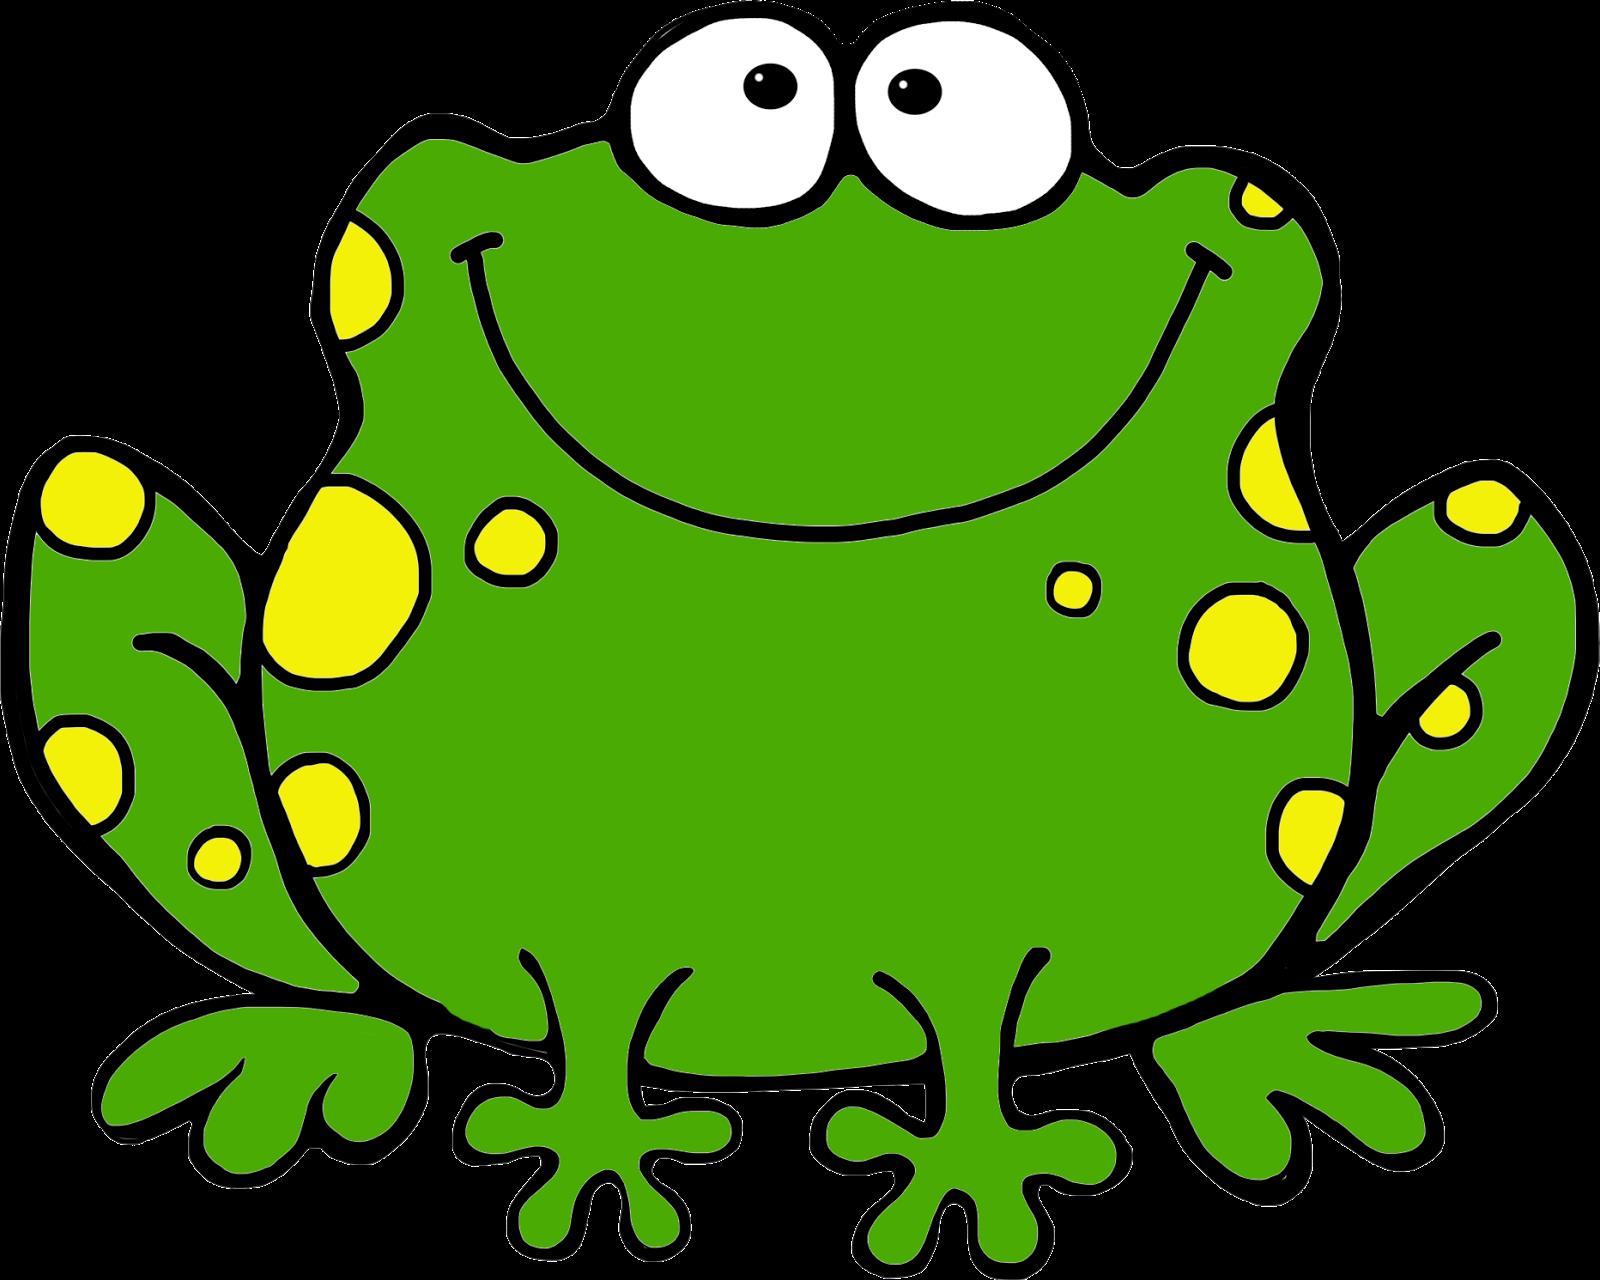 Amphibian clipart for kid Green Pie Vectors frog Cliparts